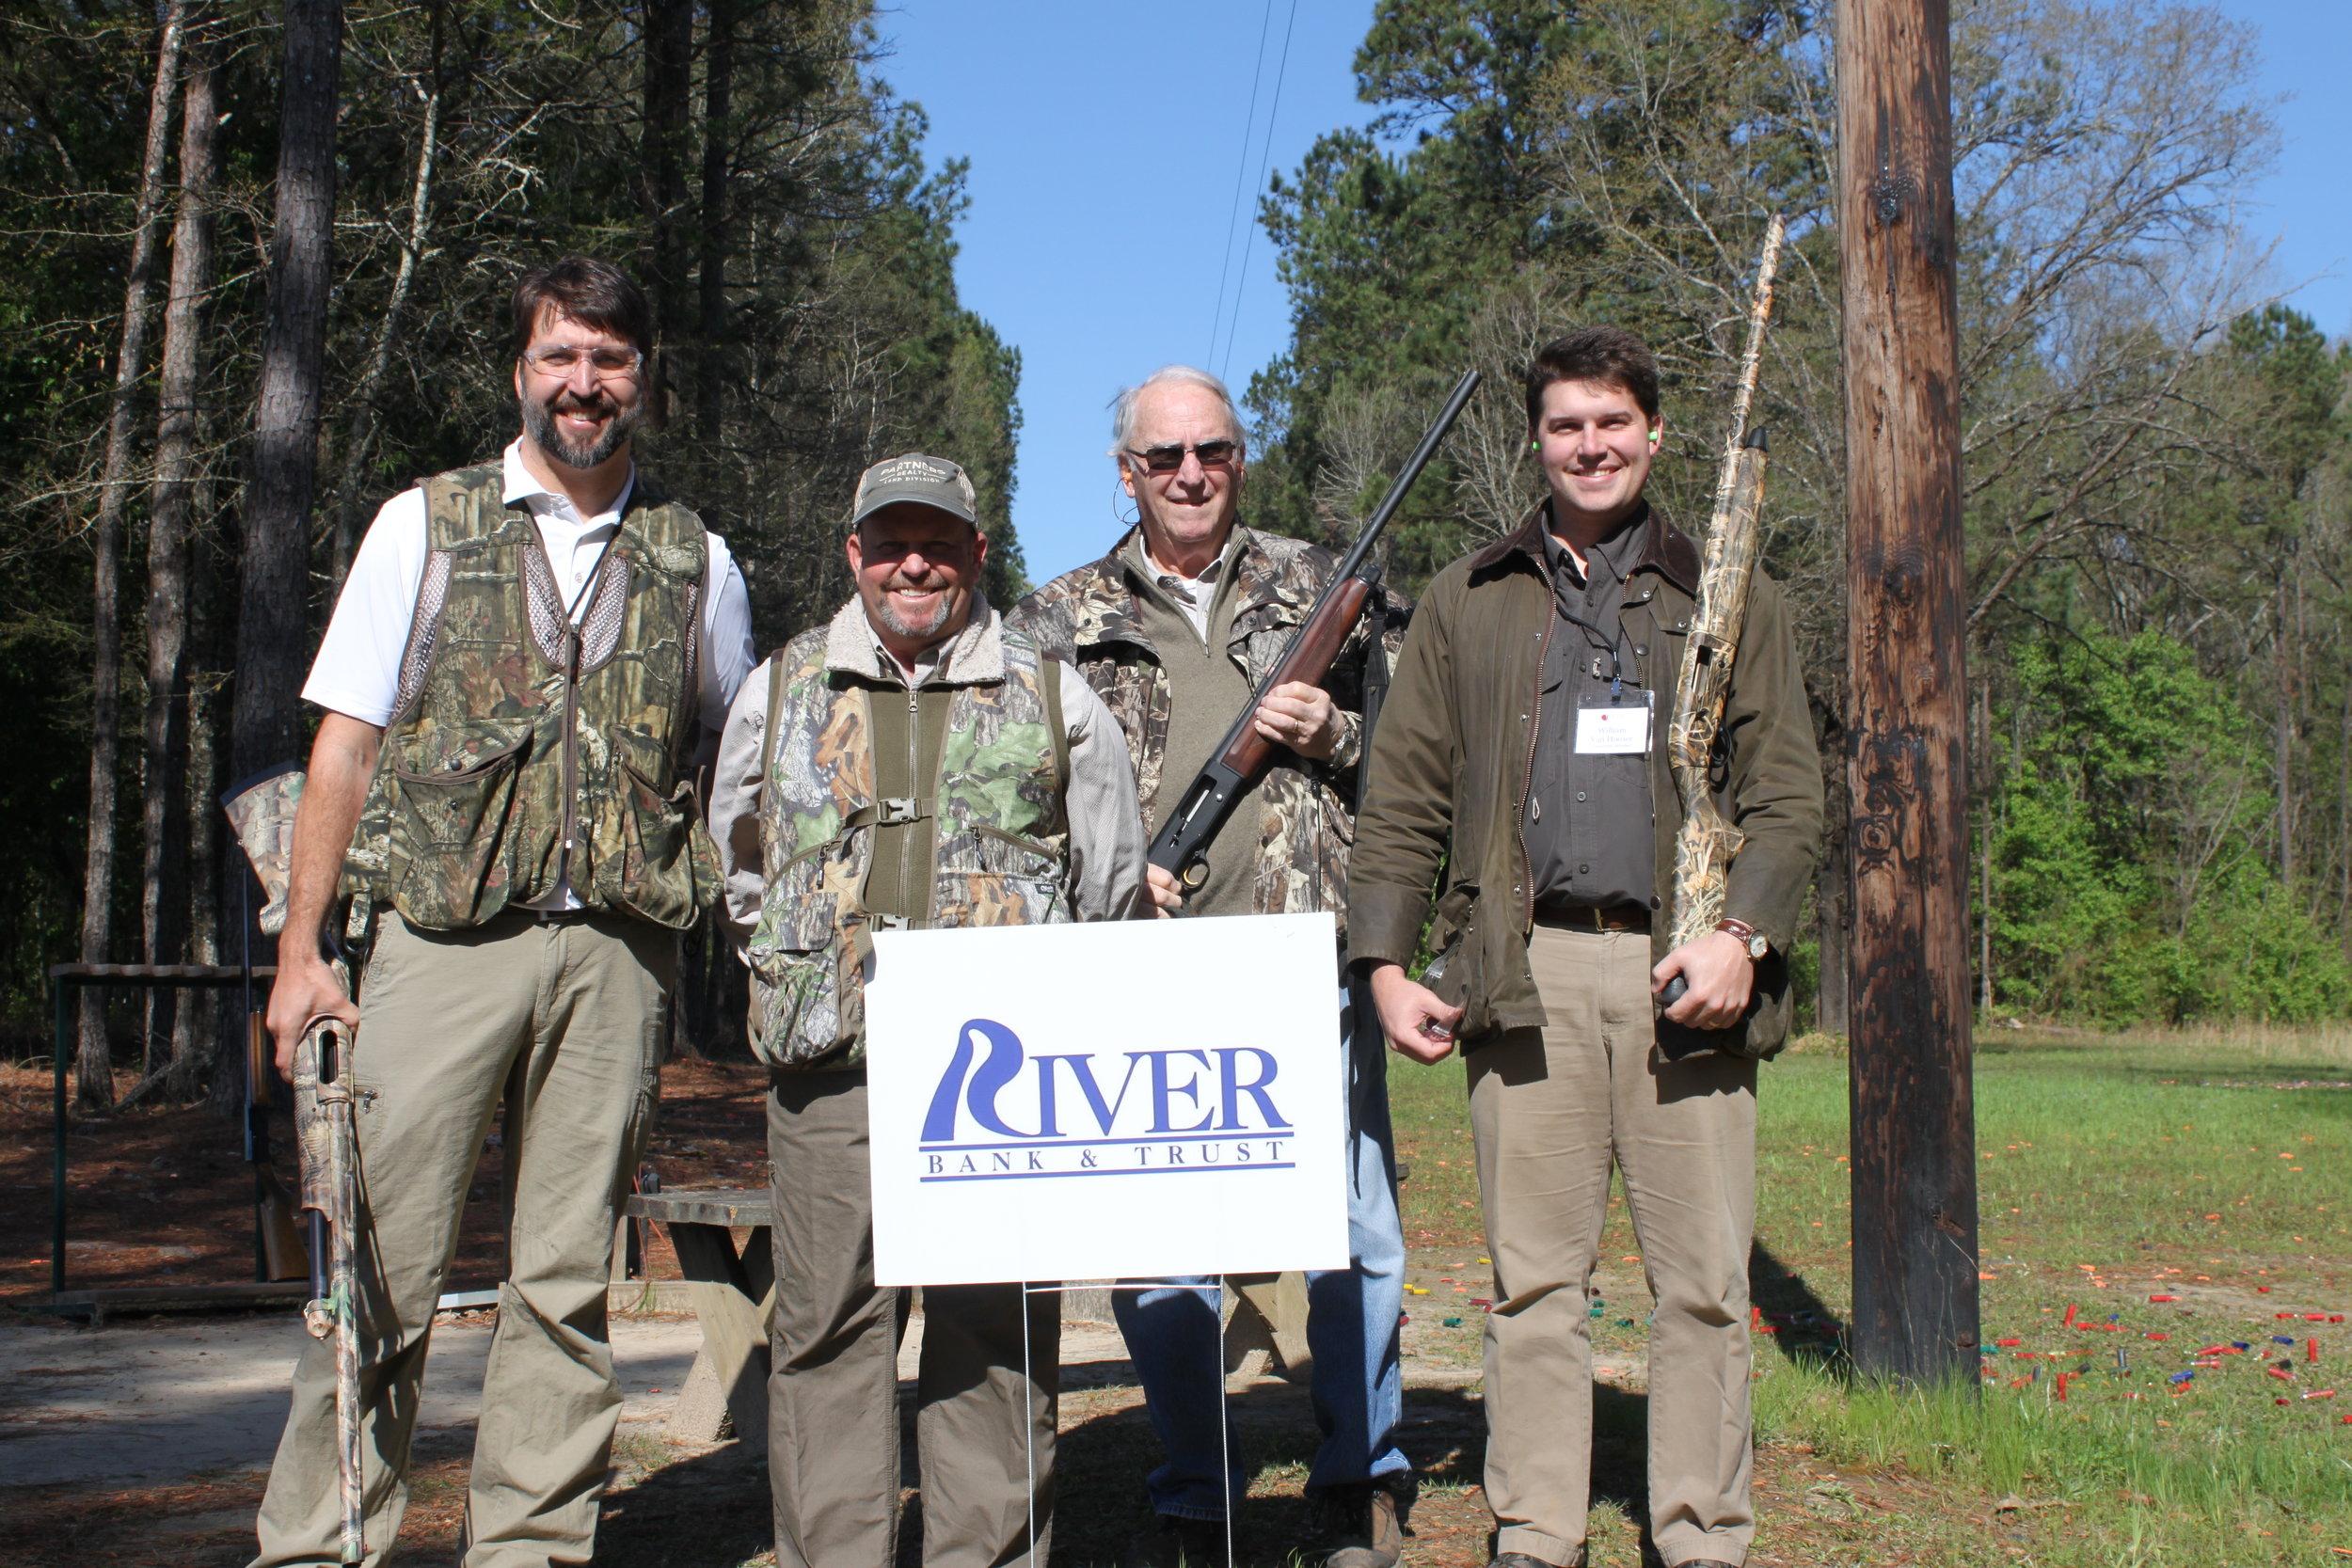 River Bank and Trust shooting team: Chris Carver, Chuck Douglass, Chuck Carver, and William Van Hooser (Starke Agency).